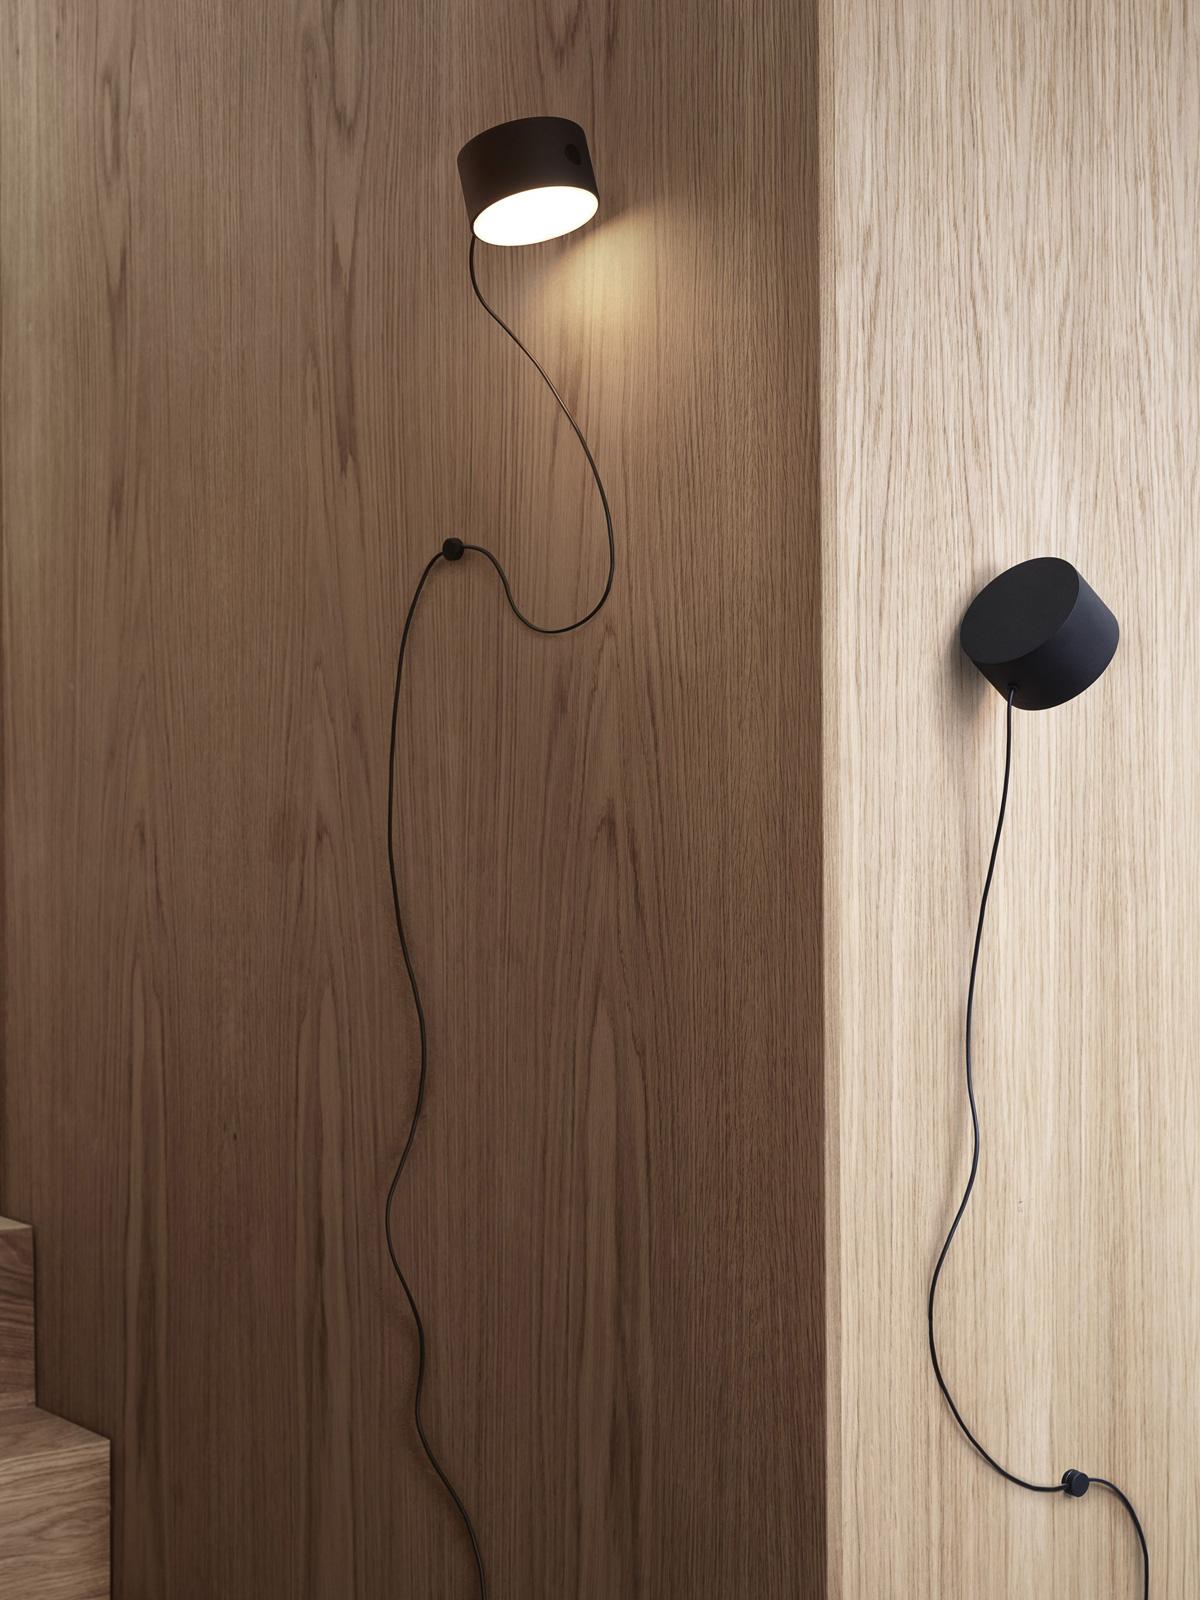 DesignOrt Blog: Post Wall Lamp Wandleuchte DesignOrt Onlineshop Lampen Berlin